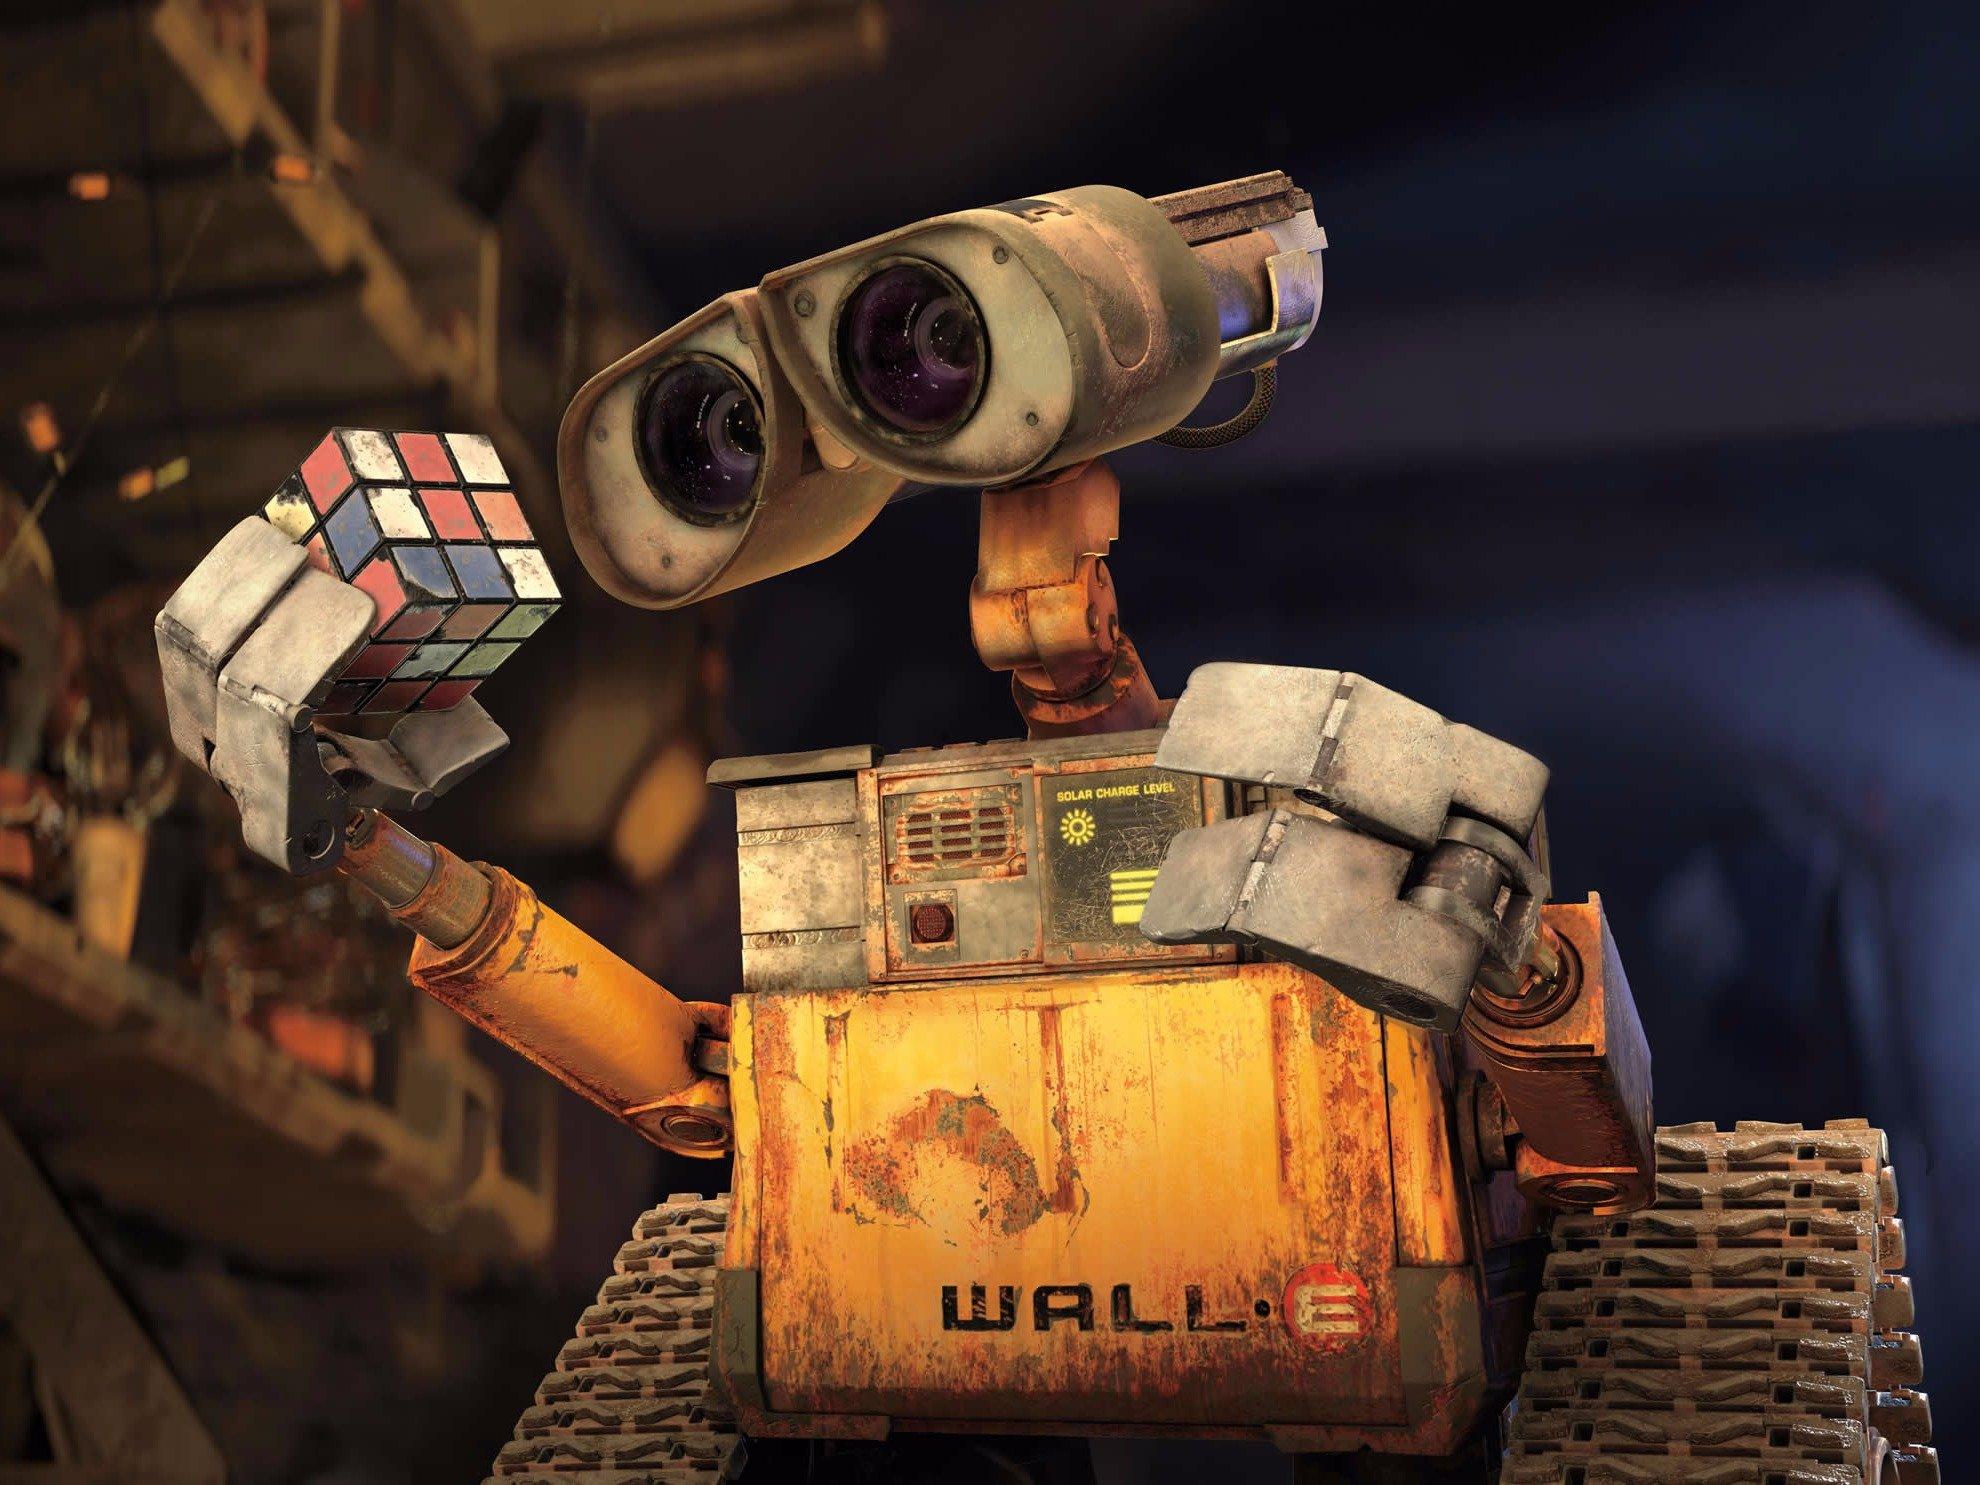 видео про робота валли банки